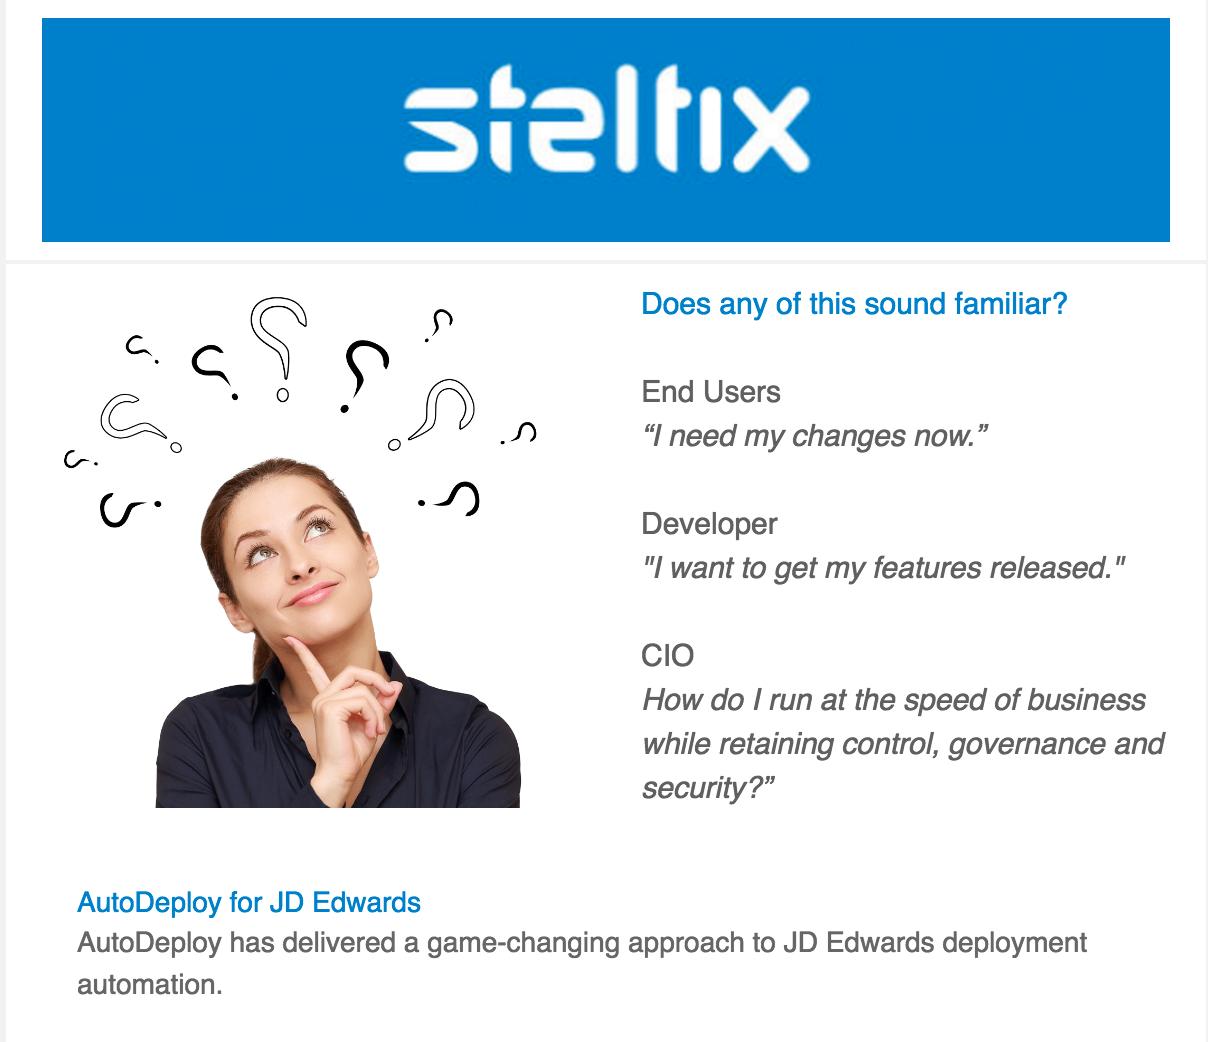 Steltix_AD